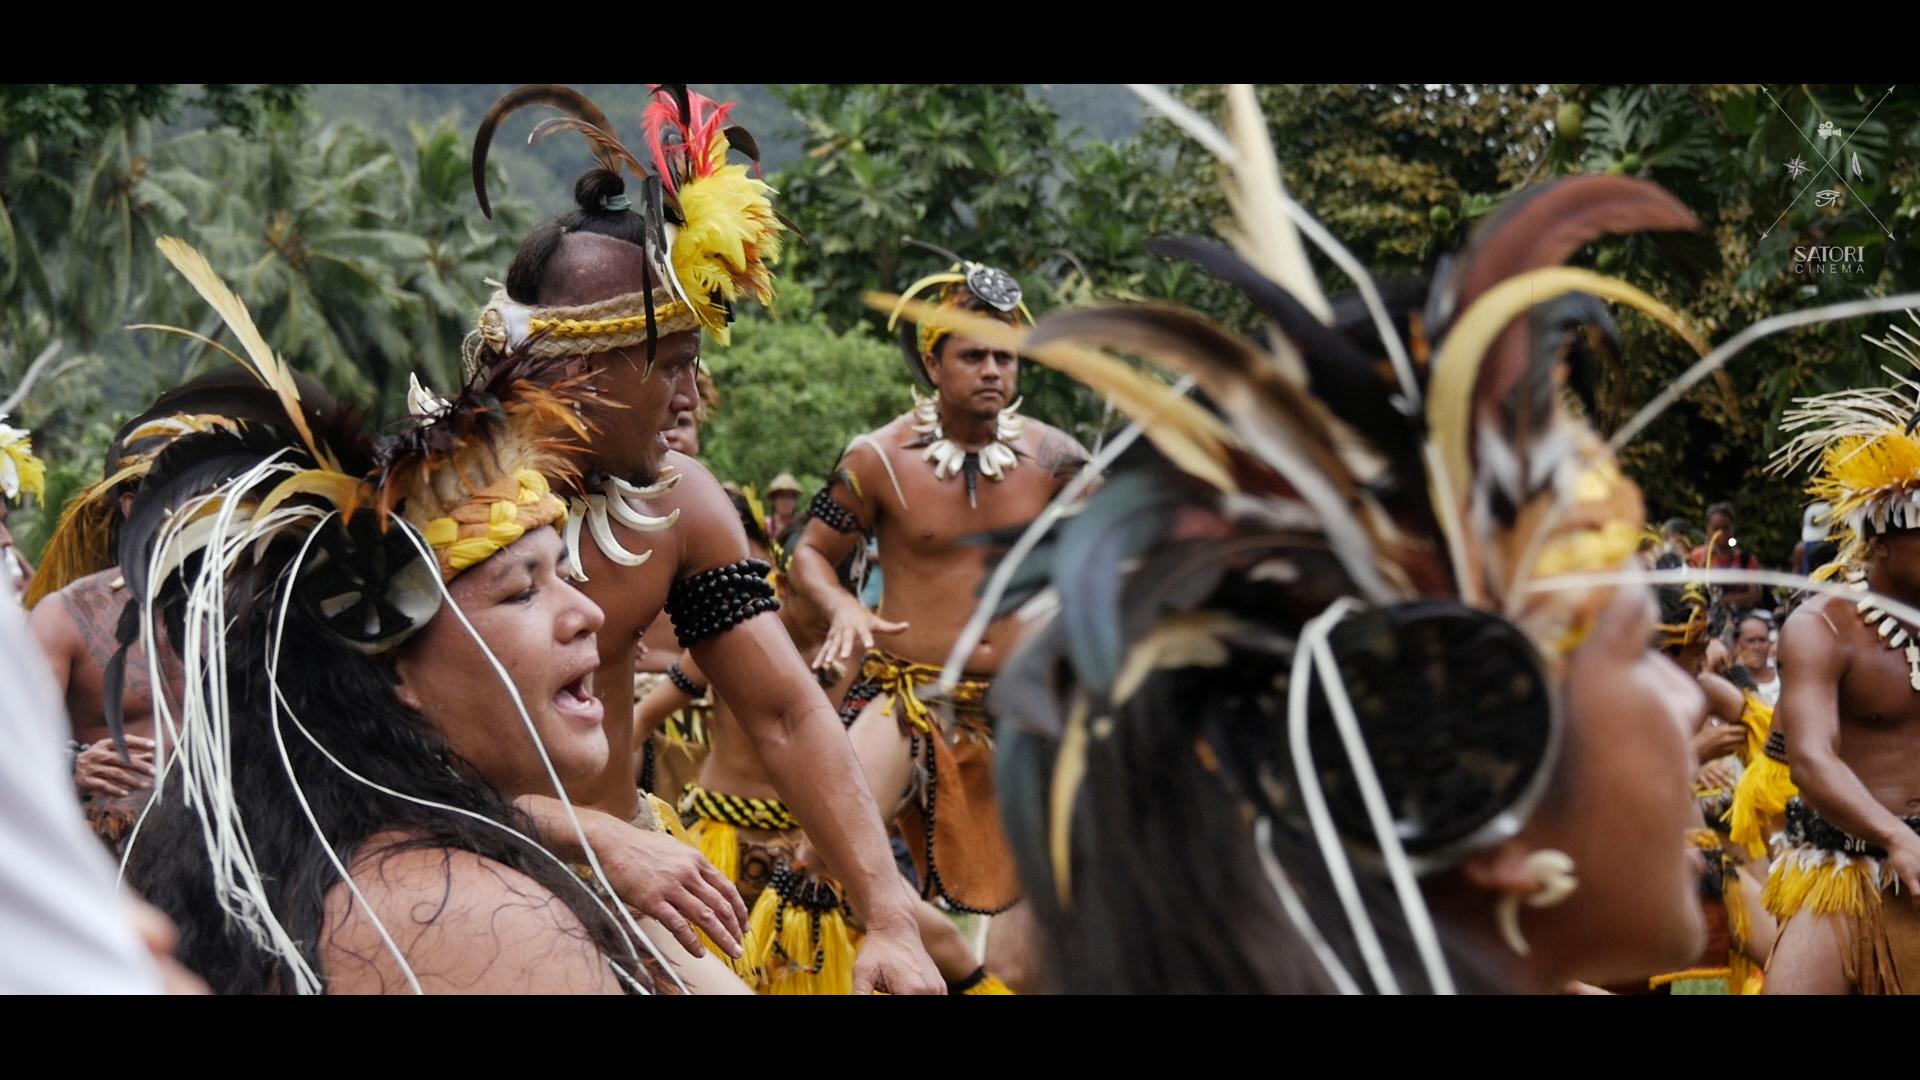 Dancers in Nuku Hiva